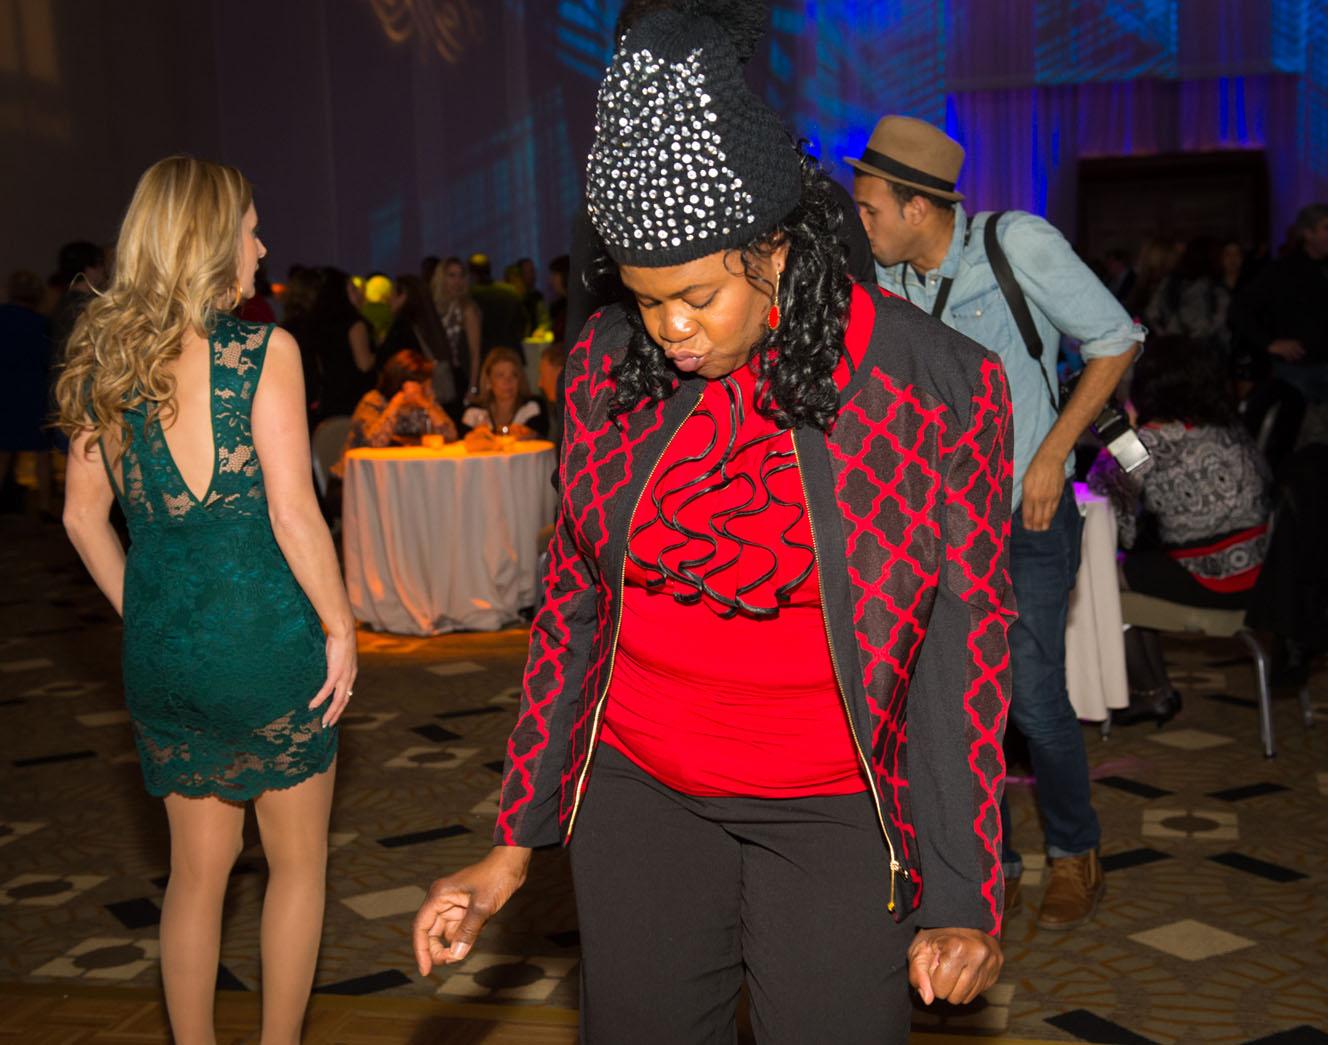 2015-12-09 ReMax Corpoarte Event - The Borgata - Atlantic City NJ - Photo Sesh - 2015-5109.jpg